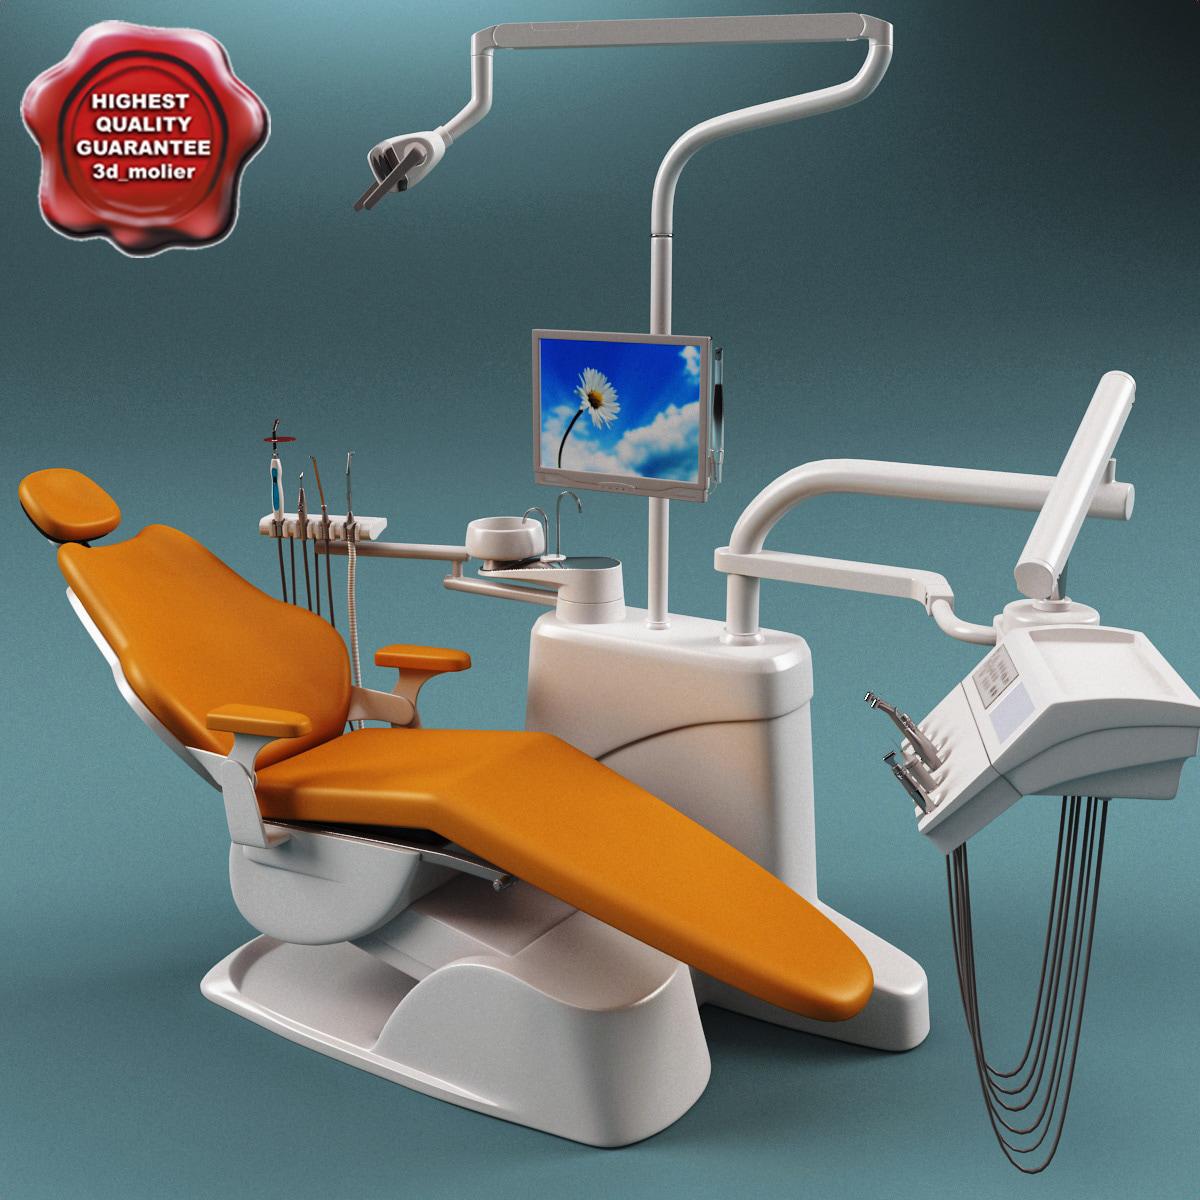 Dental_Unit_CX_8900LU_00.jpg